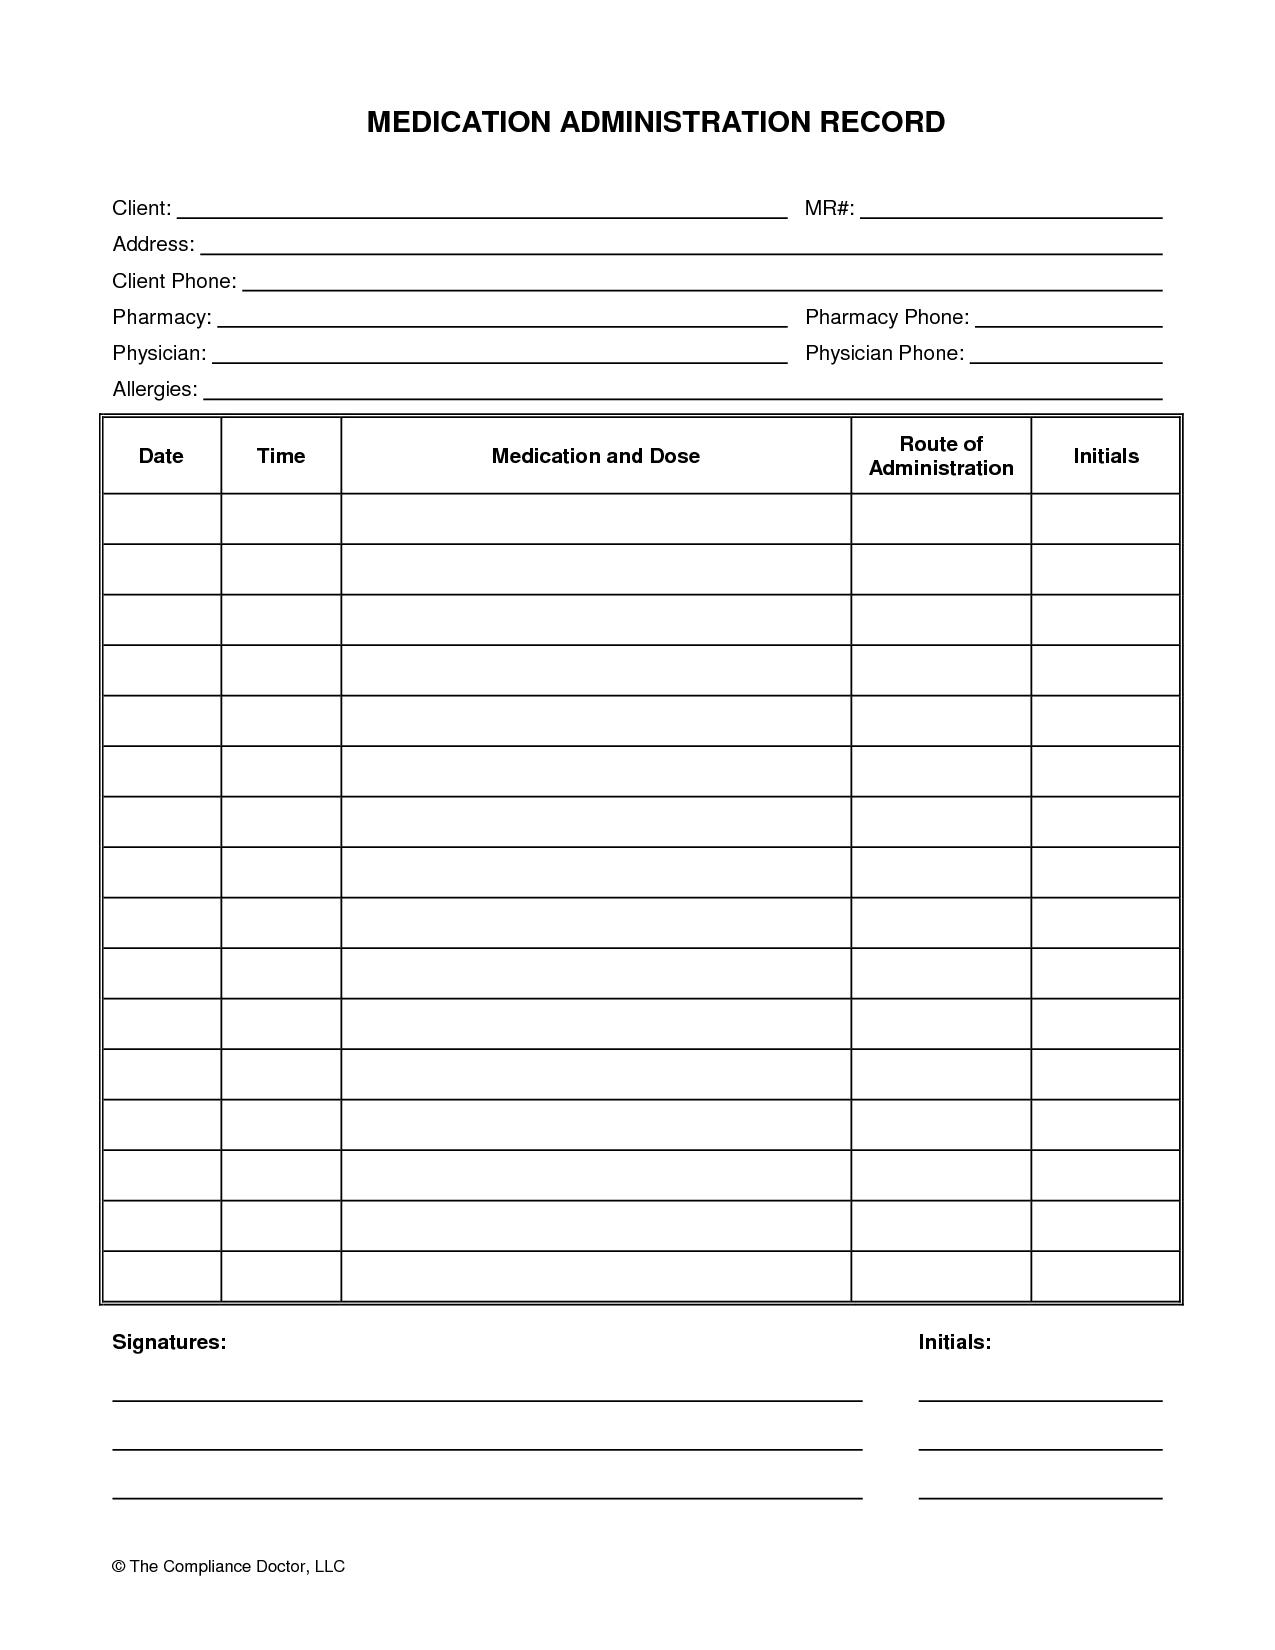 Medication Administration Record Form   Organization   Medication - Free Printable Medicine Daily Chart